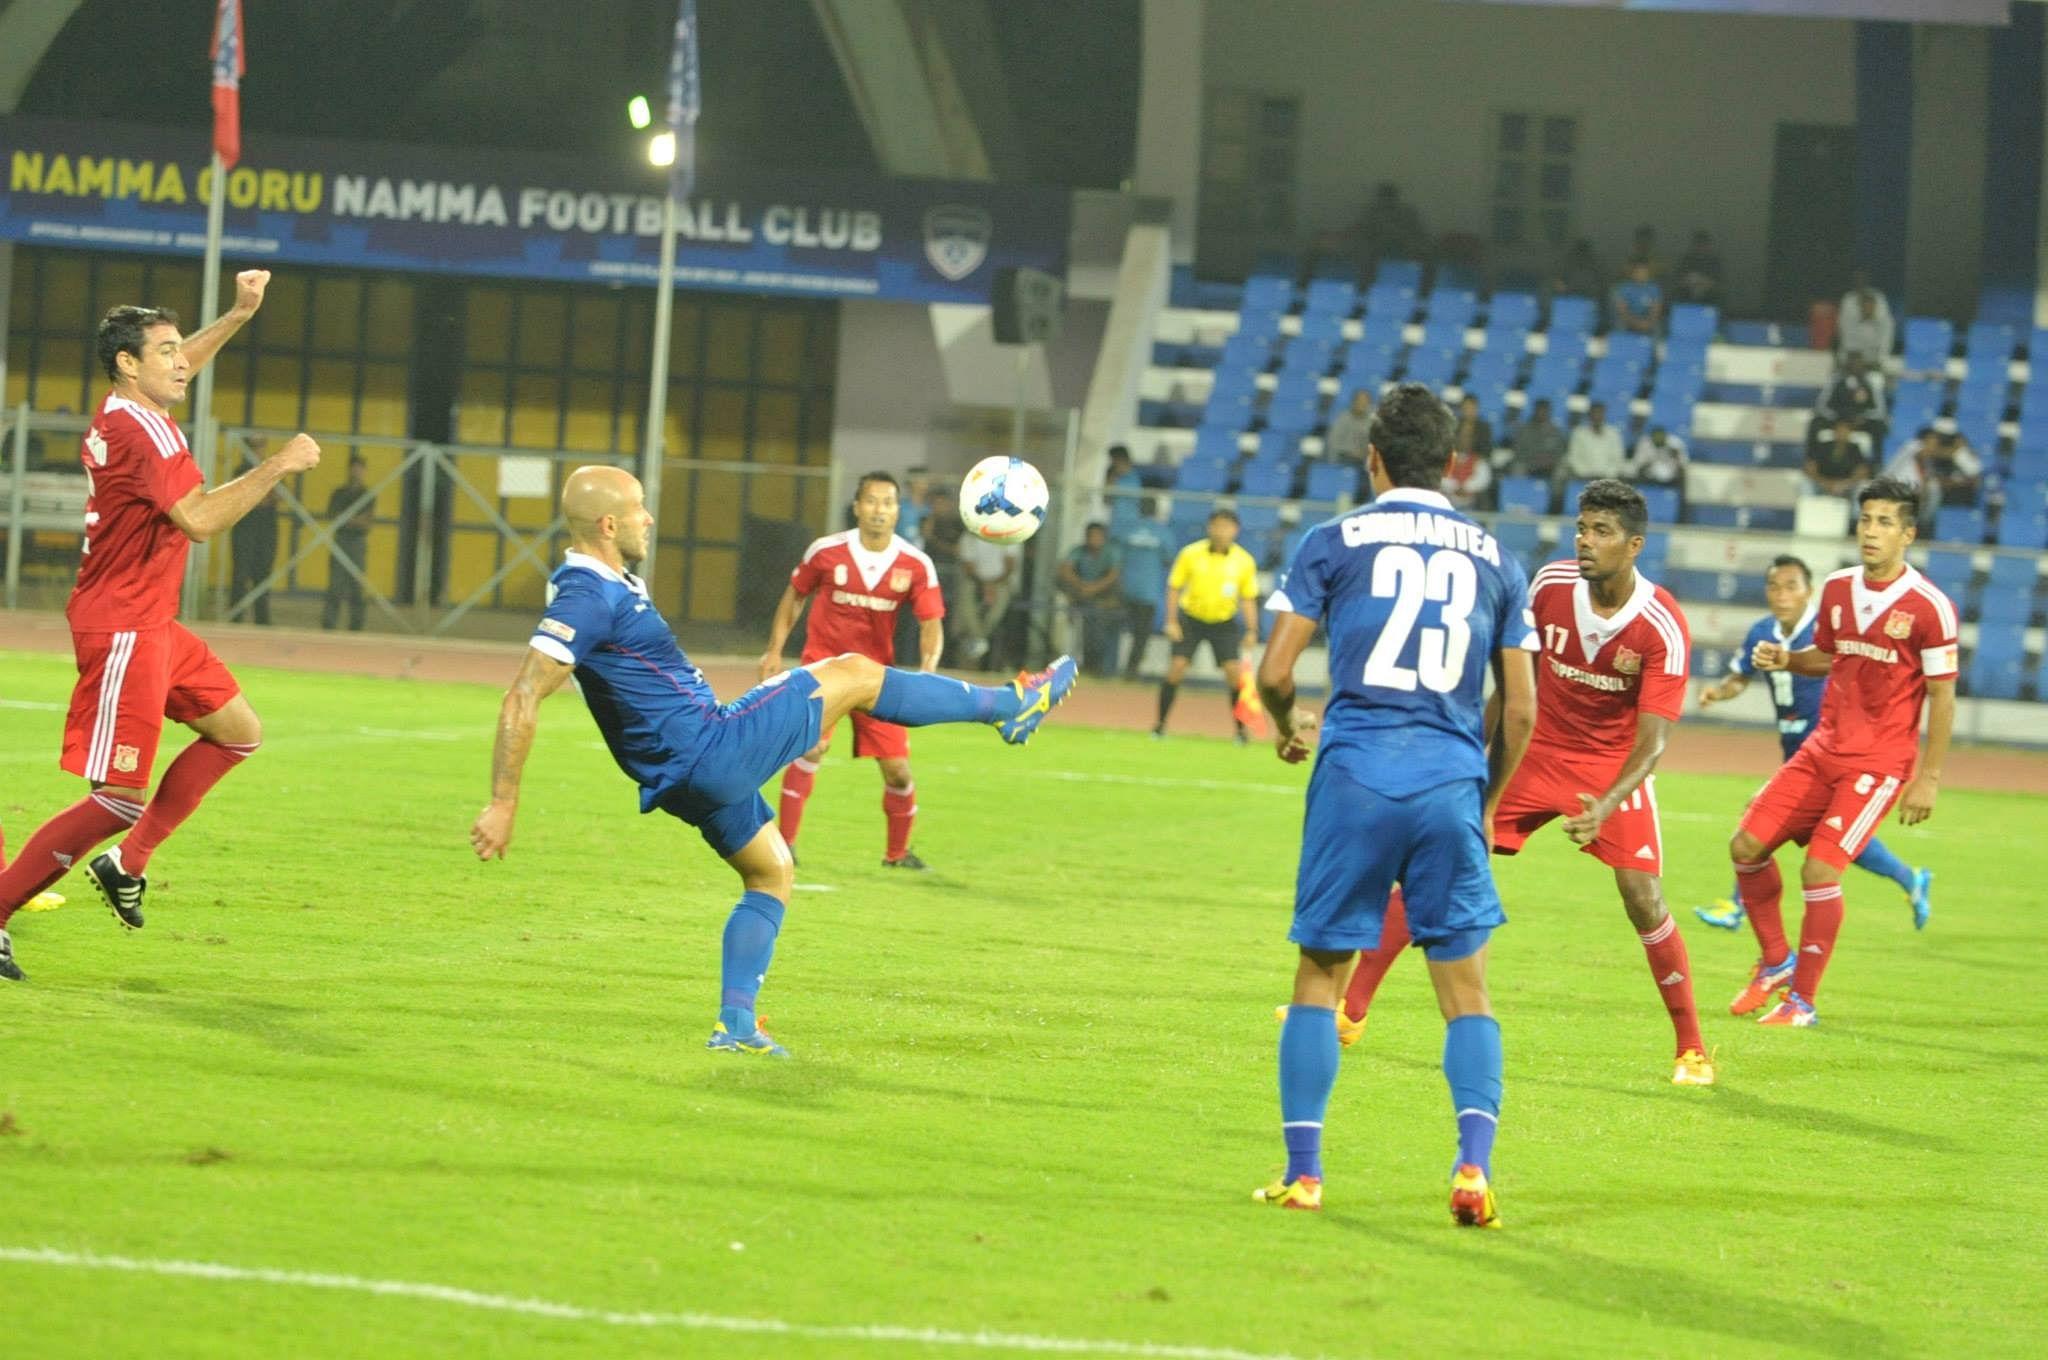 I-League: Impressive Pune FC sink Bengaluru FC 3-1